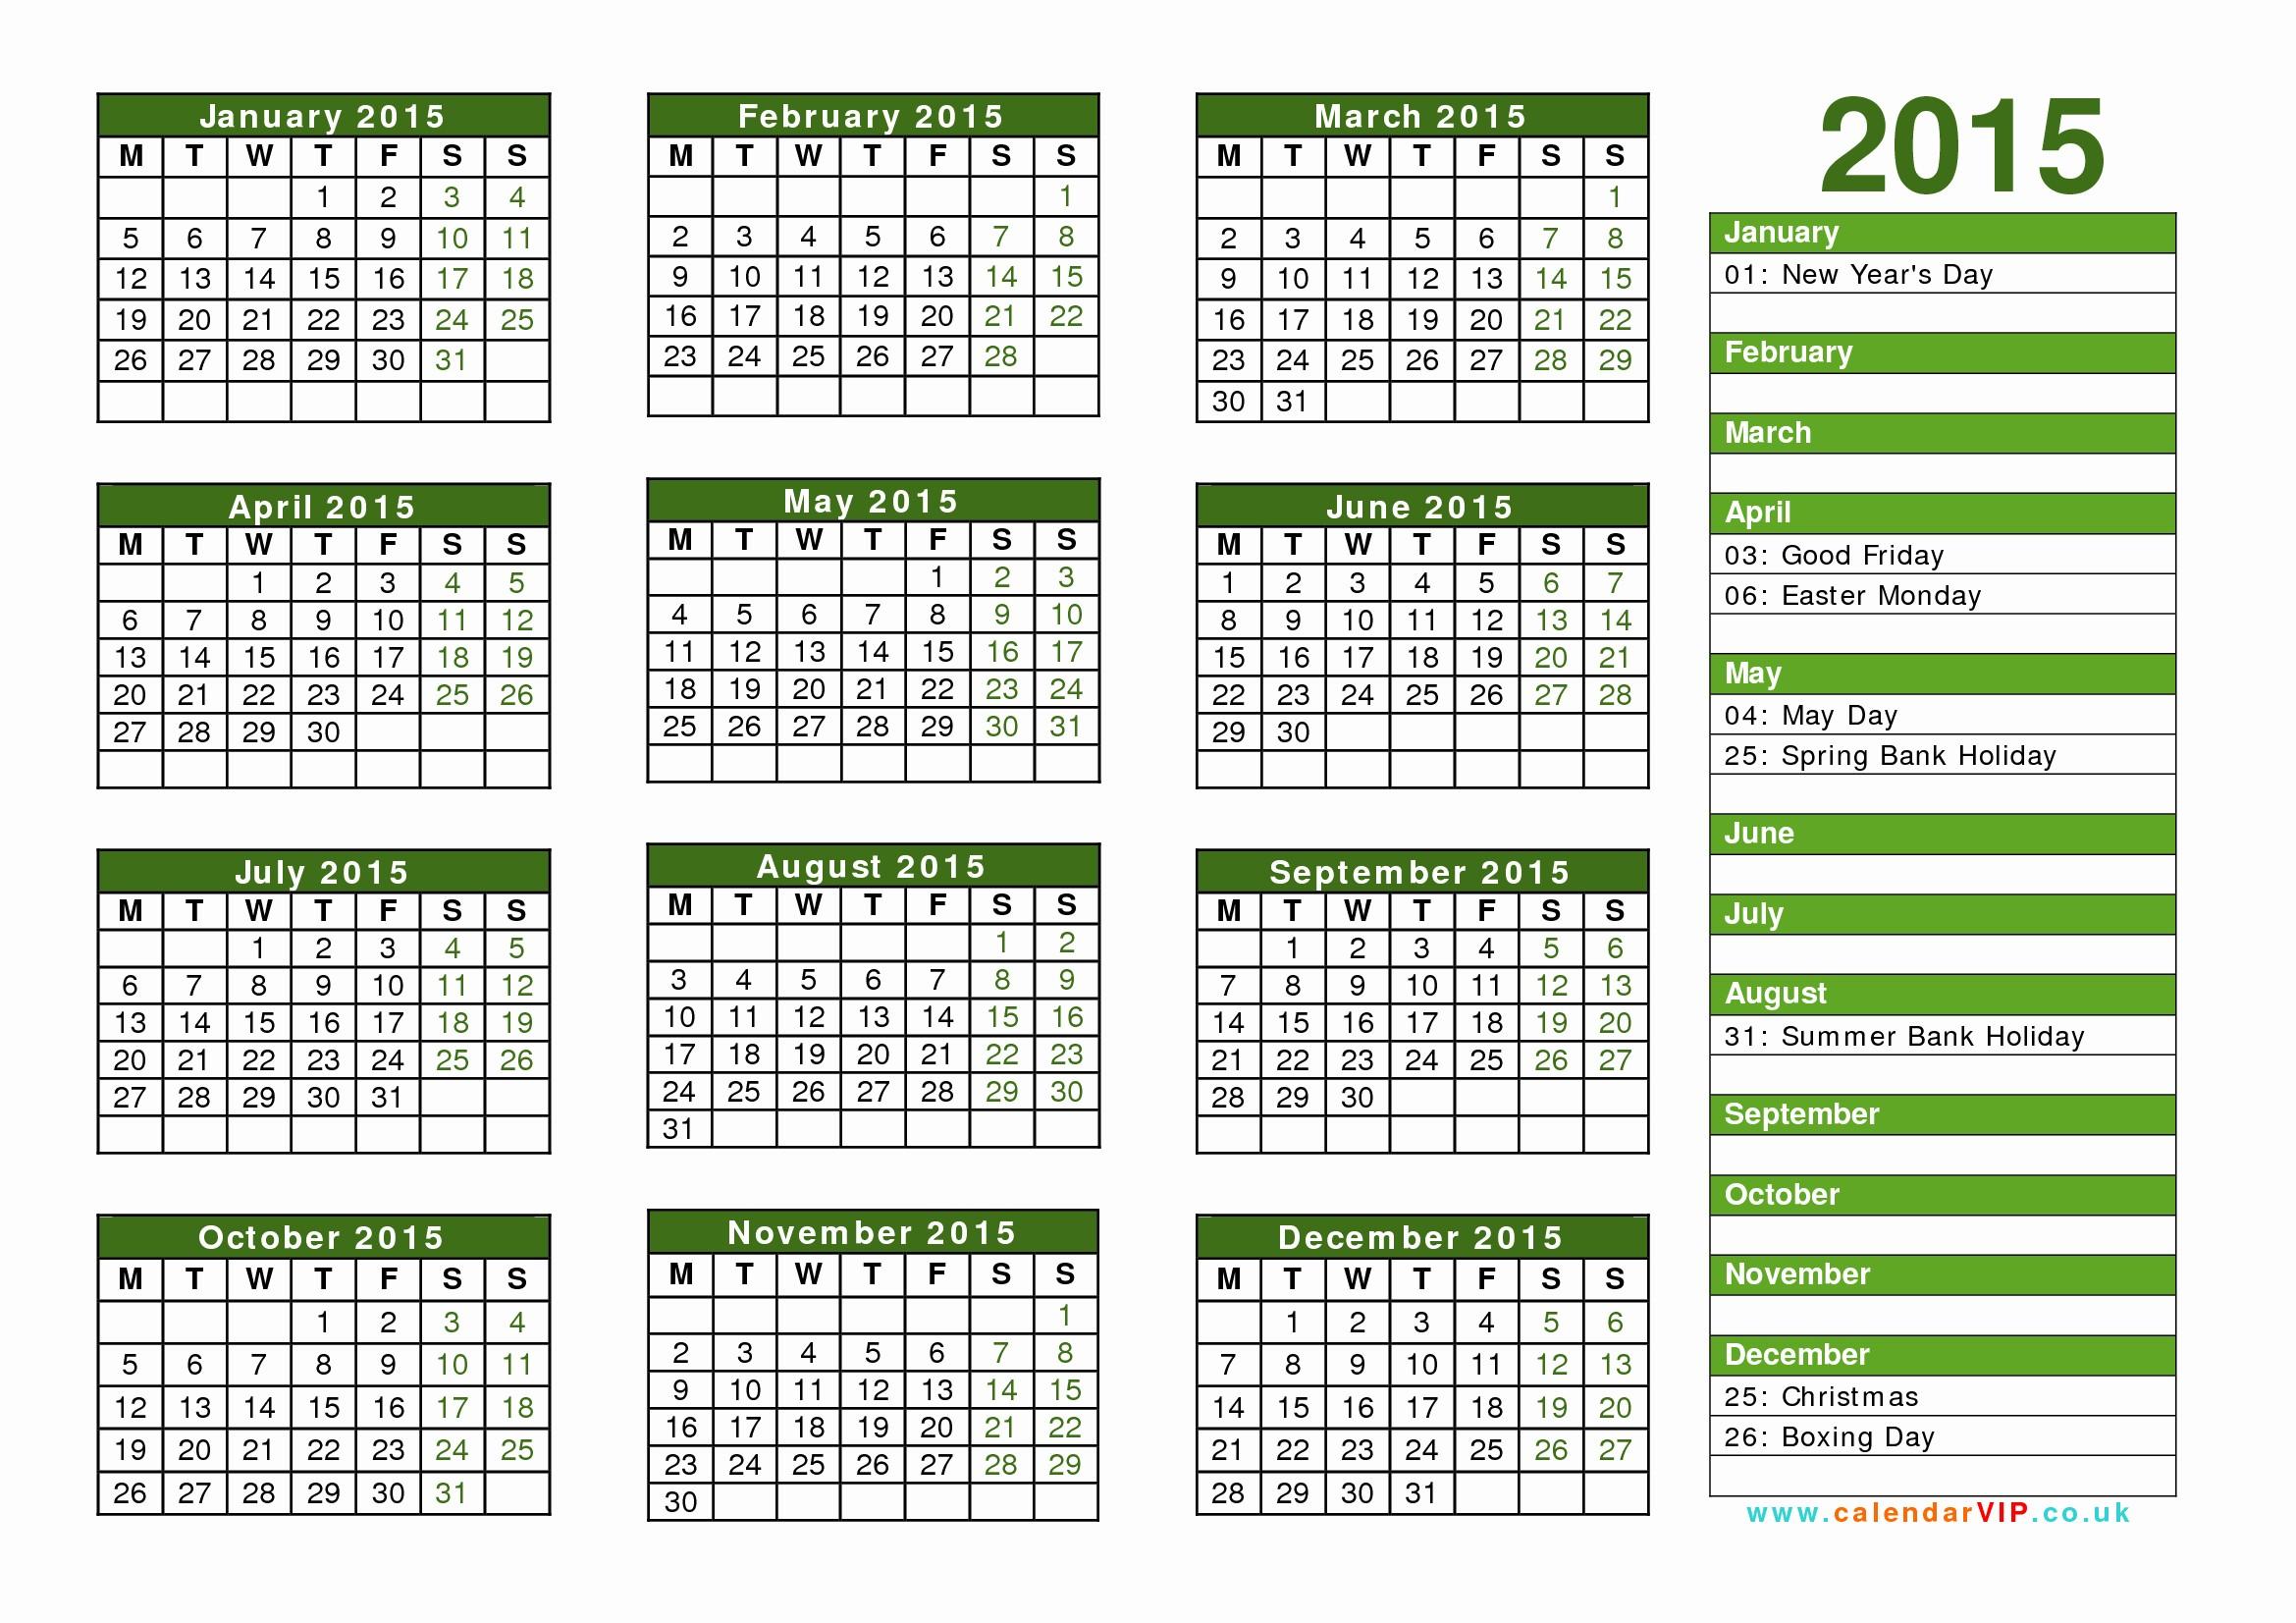 Free 2015 Yearly Calendar Template Elegant Calendar 2015 Uk Free Yearly Calendar Templates for Uk